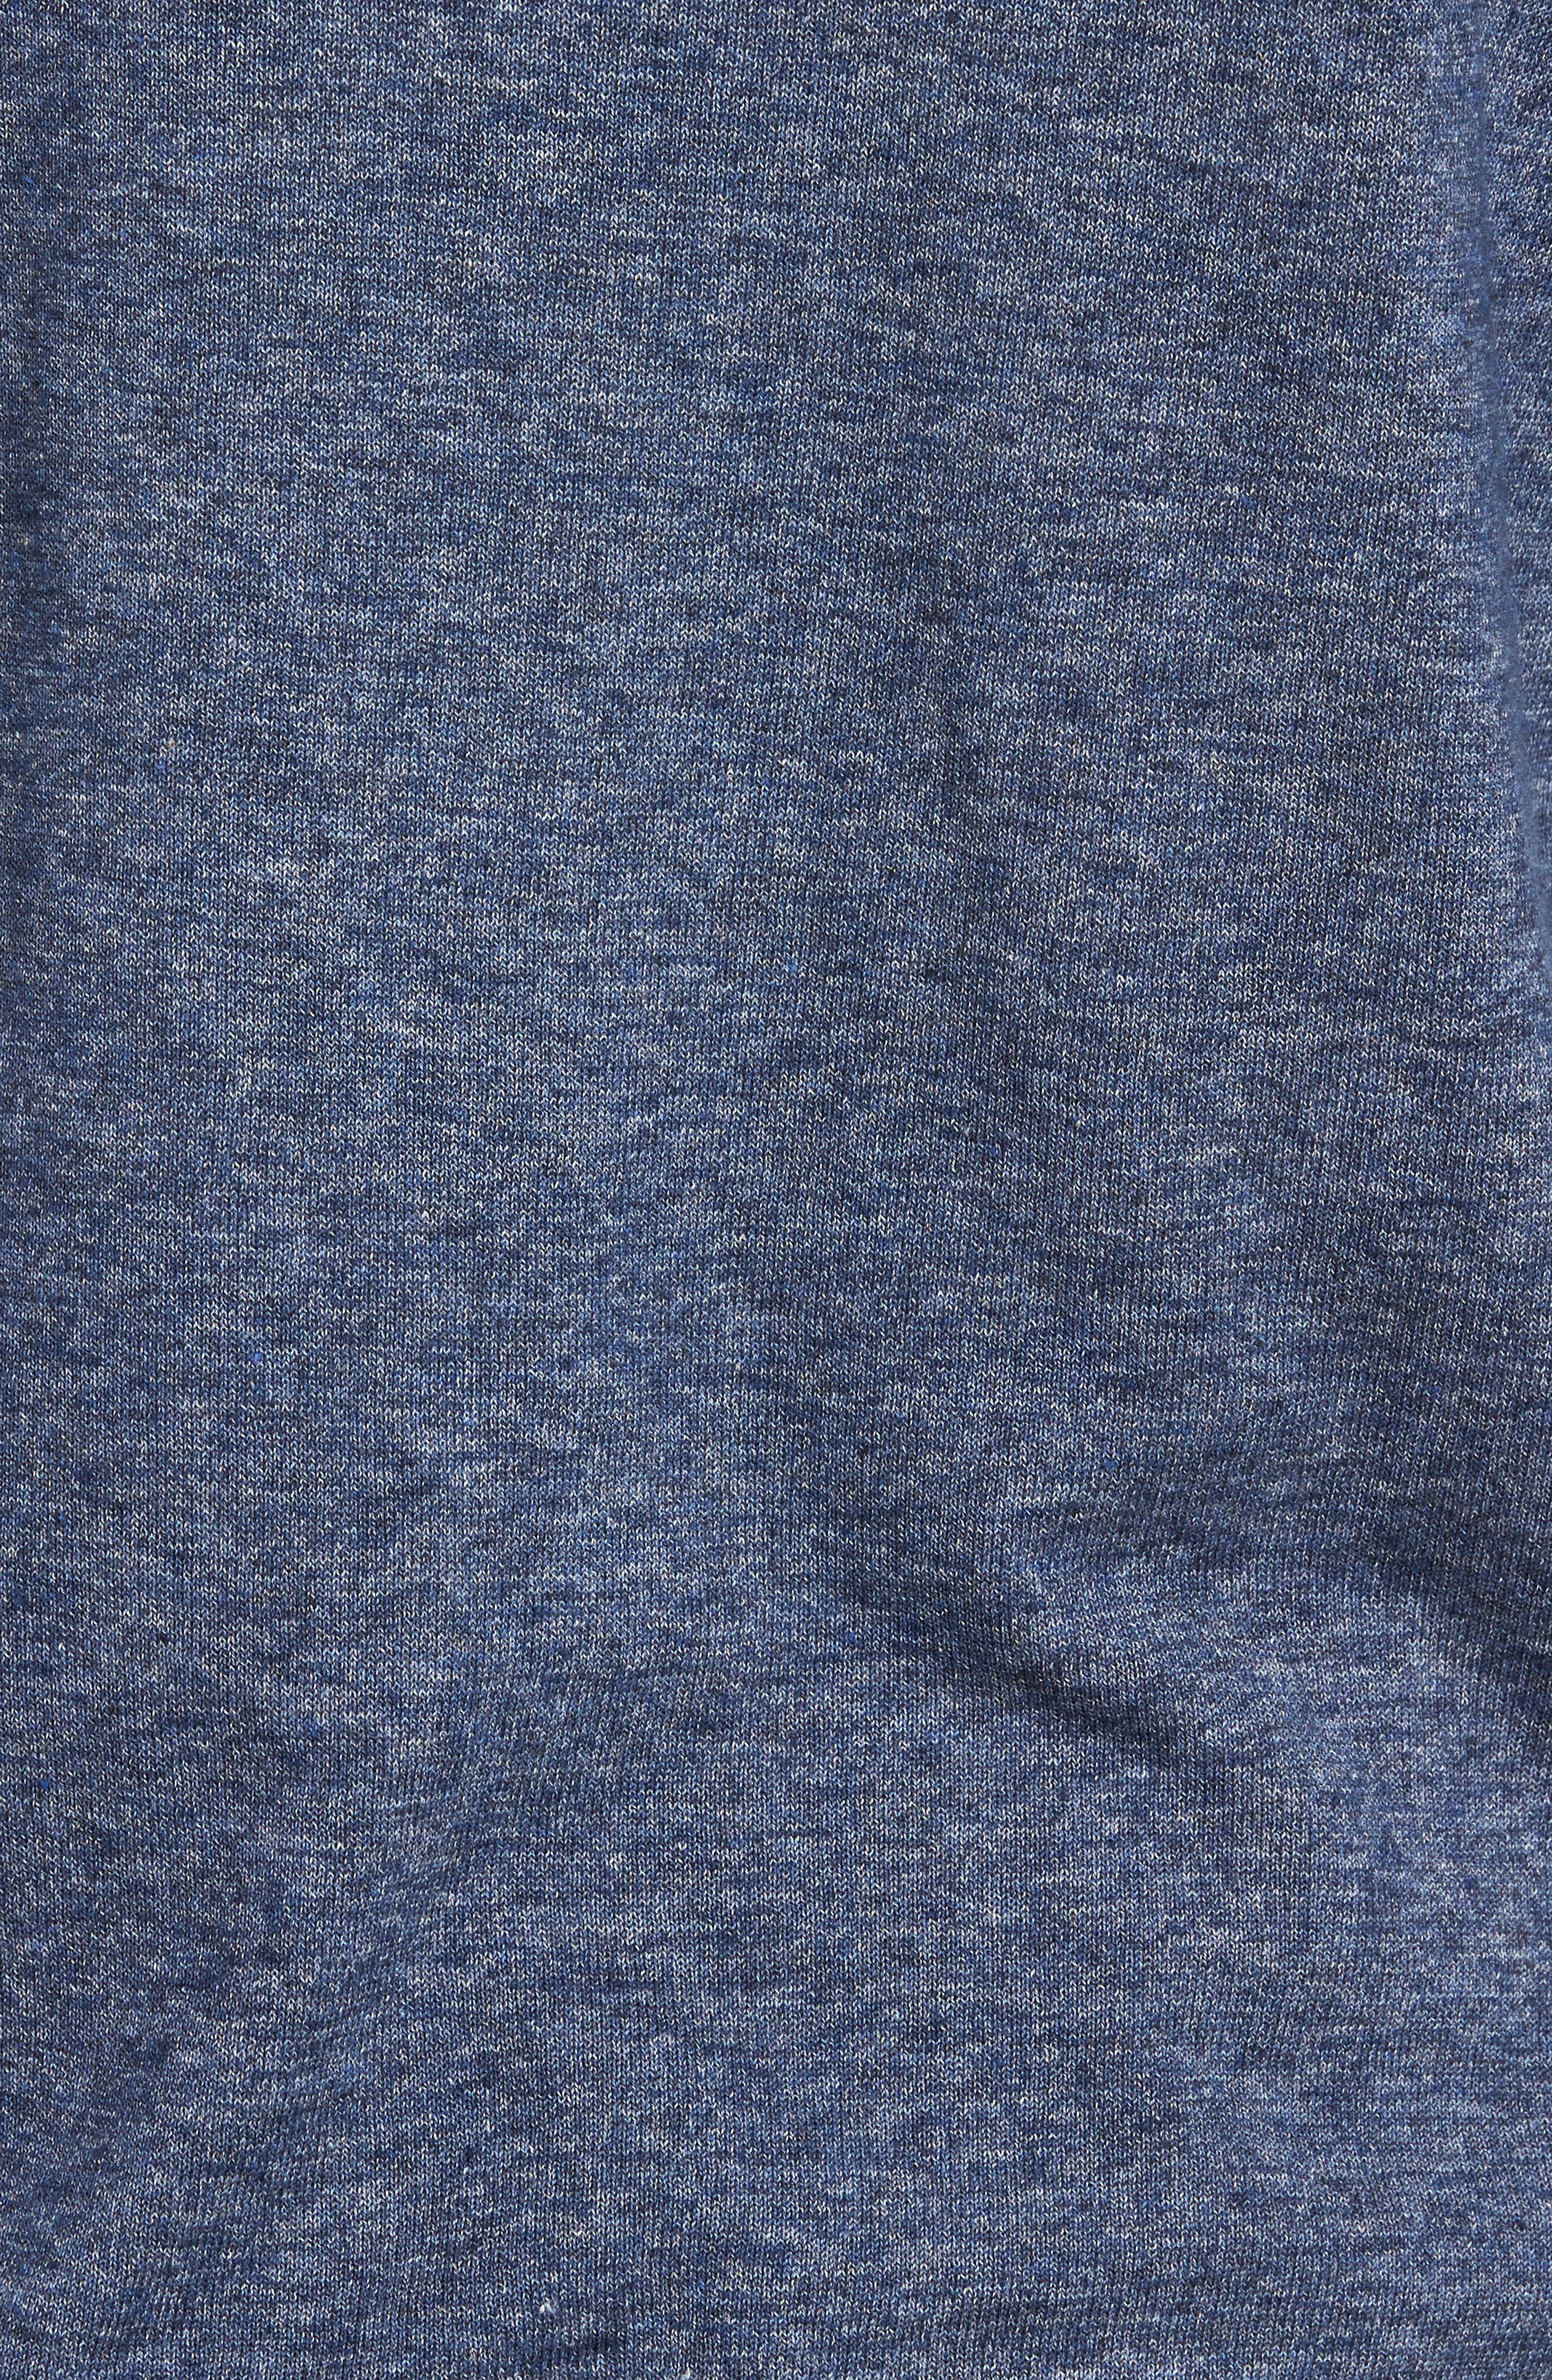 Hess Wool Turtleneck Sweater,                             Alternate thumbnail 10, color,